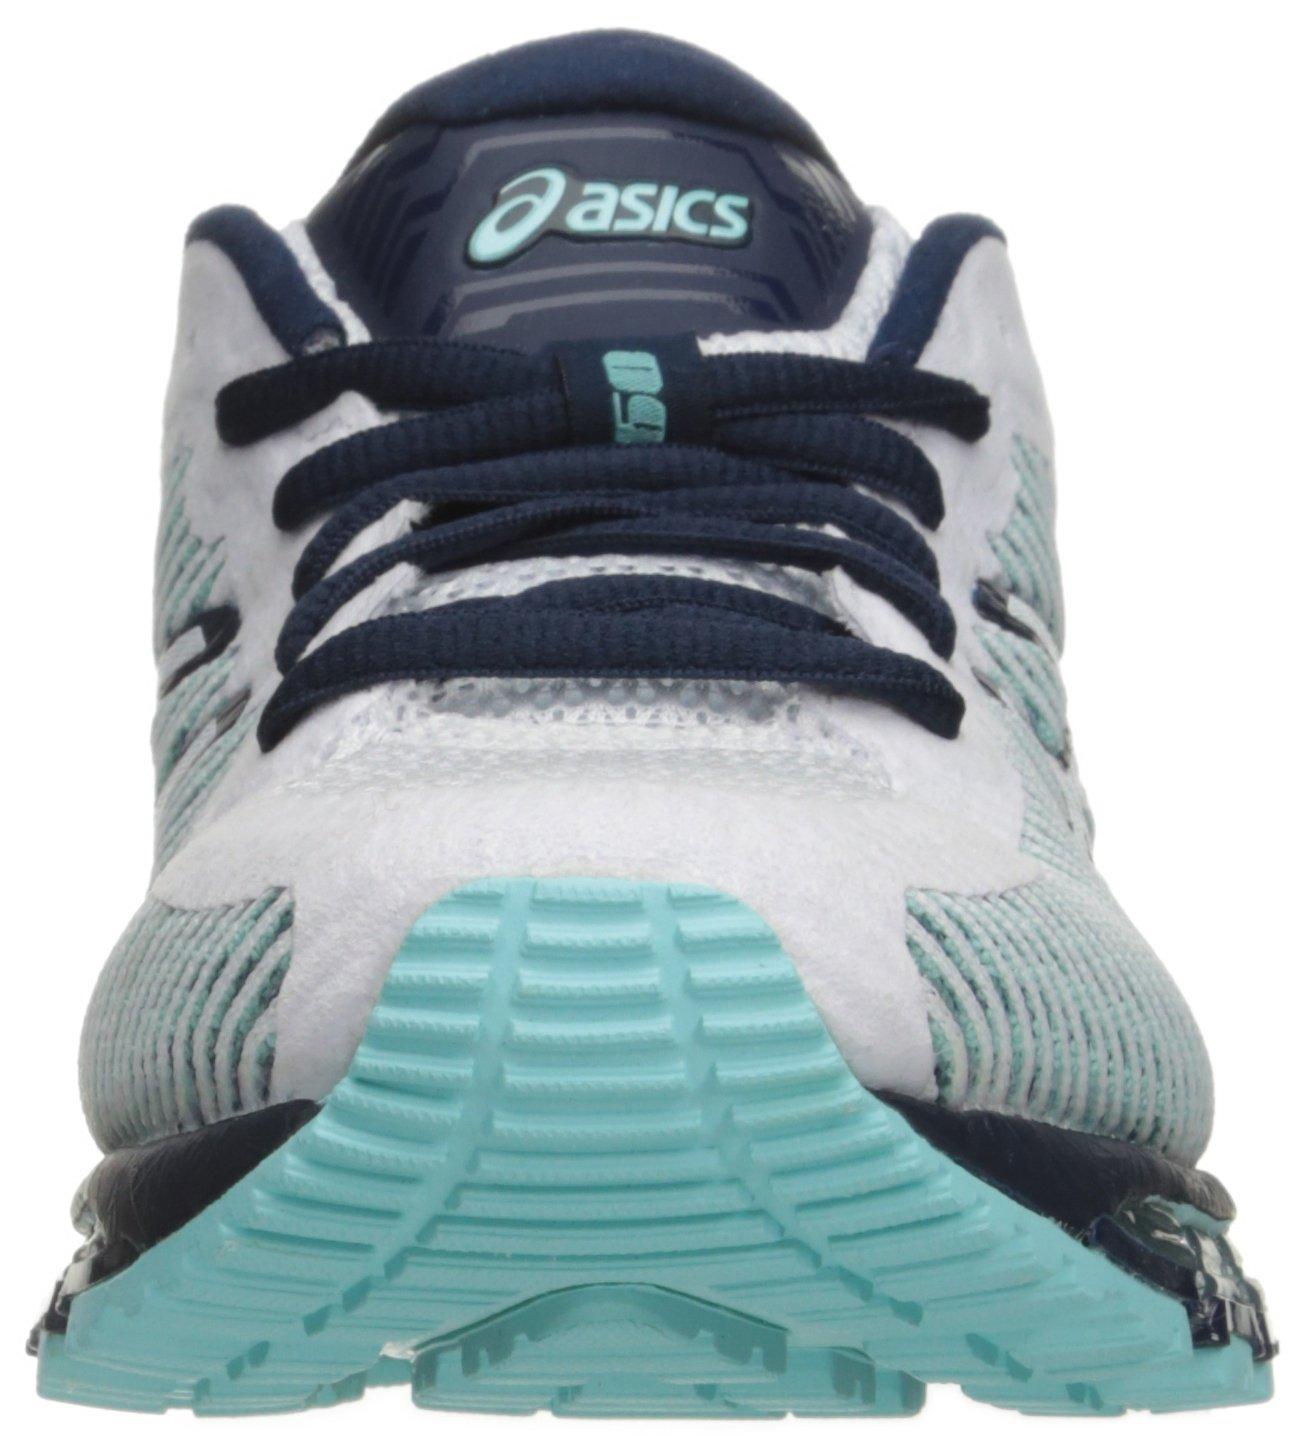 Zapato de Aruba avec Zapato ASICS Gel azul Gel Quantum avec 360 13537 cm para ea0e25d - njyc.info